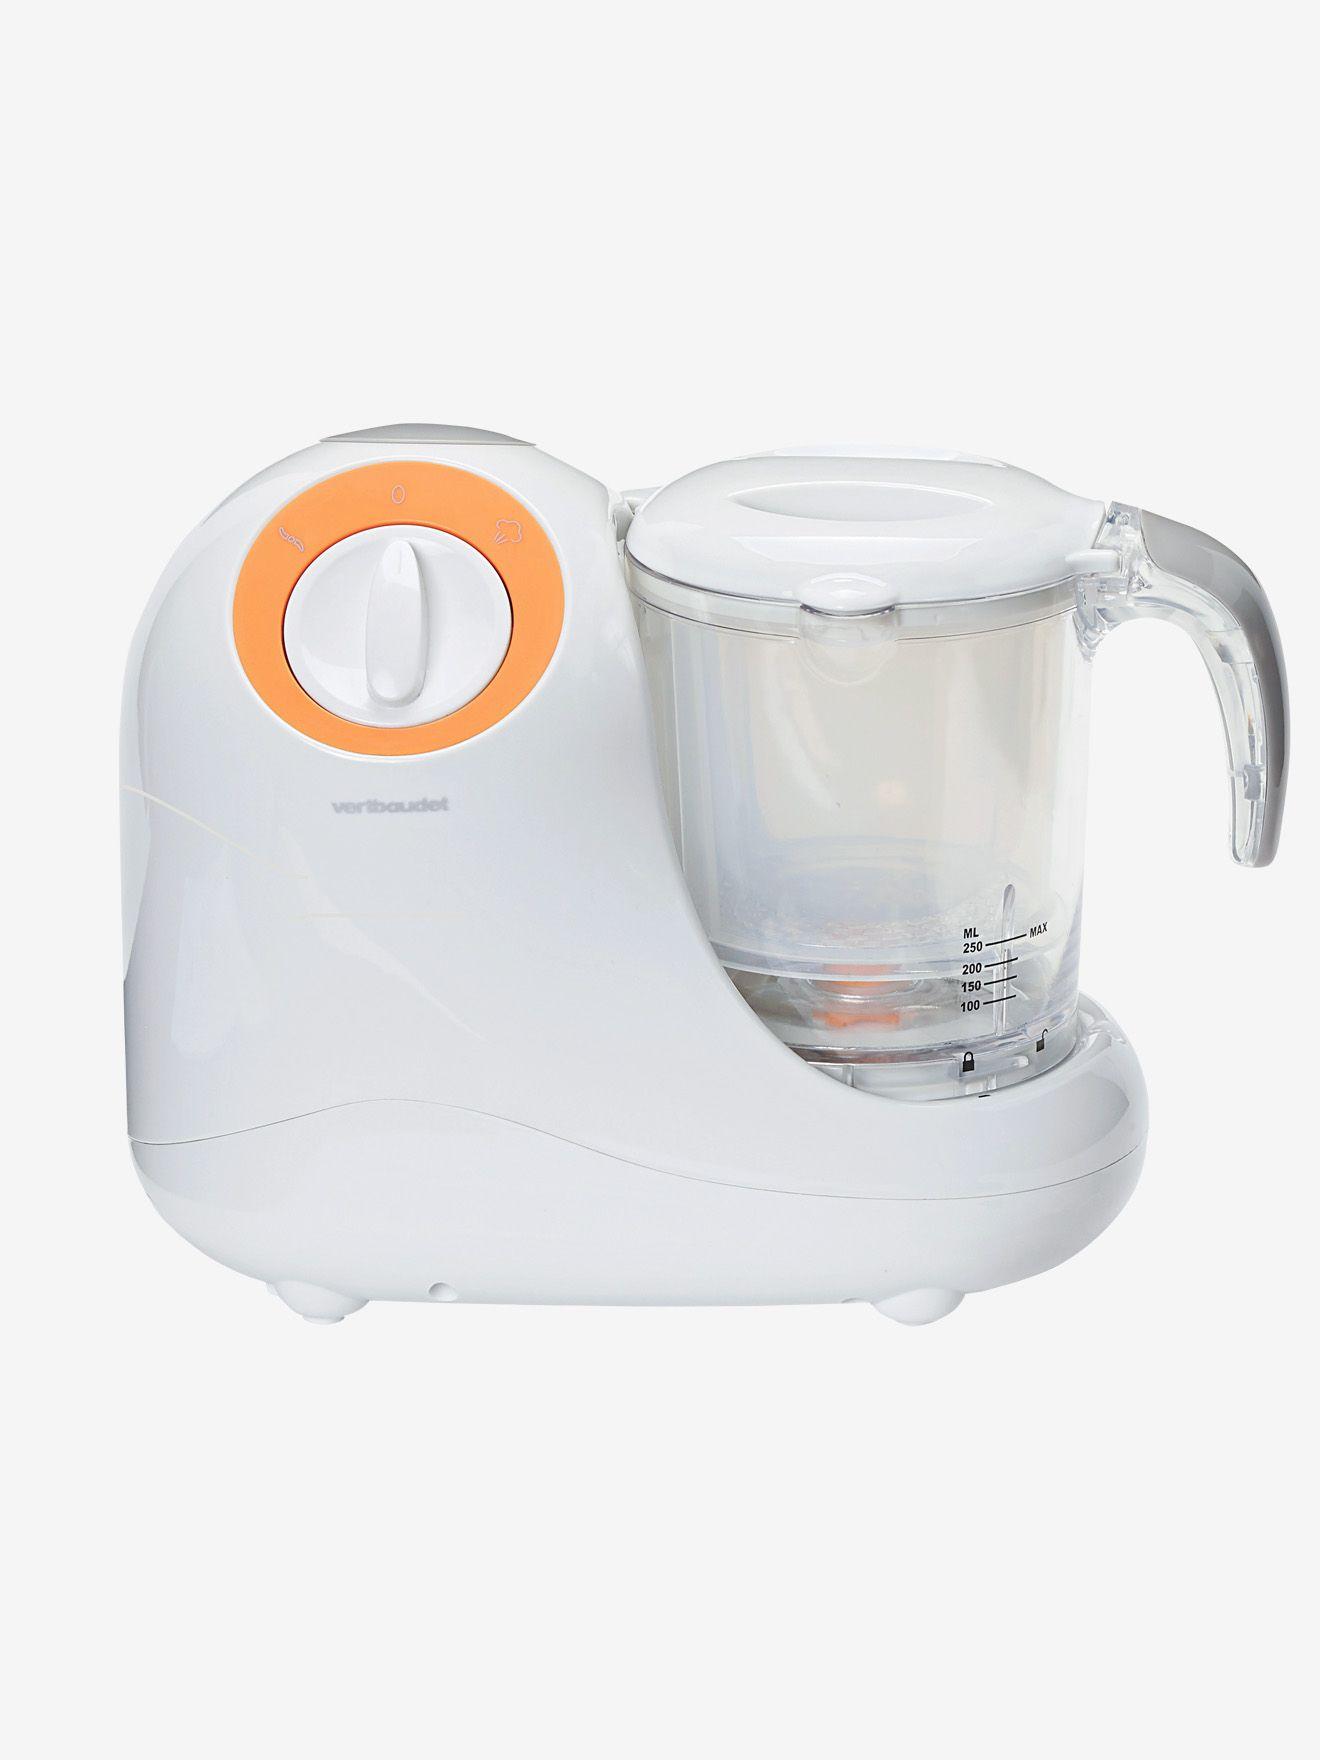 Robot cuiseur mixeur vapeur MagicCooker 5 en 1